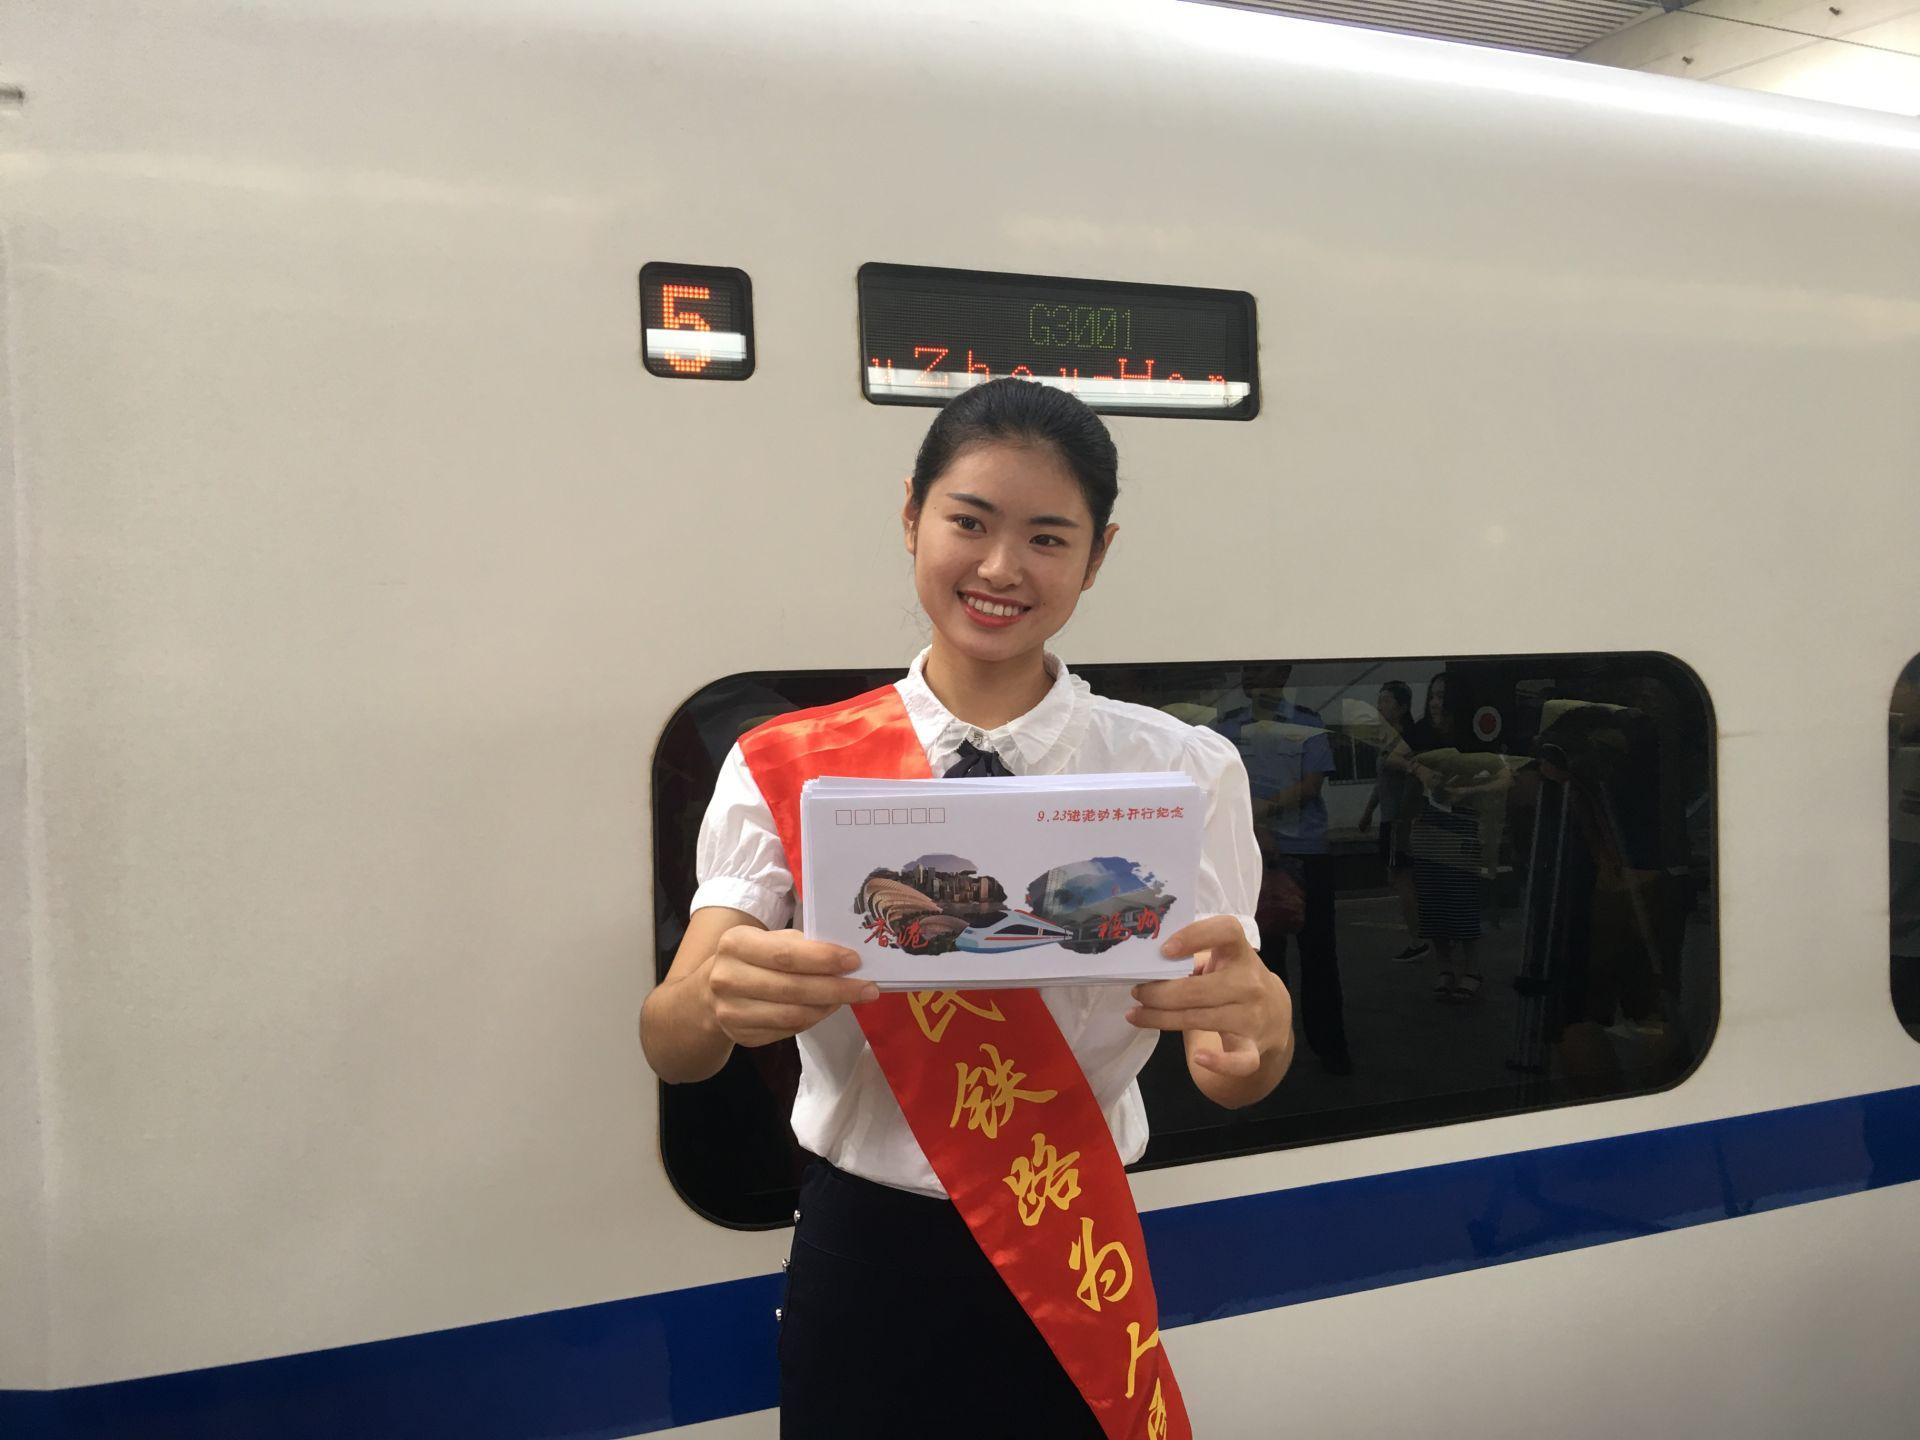 http://www.clzxc.com/wenhuayichan/10105.html